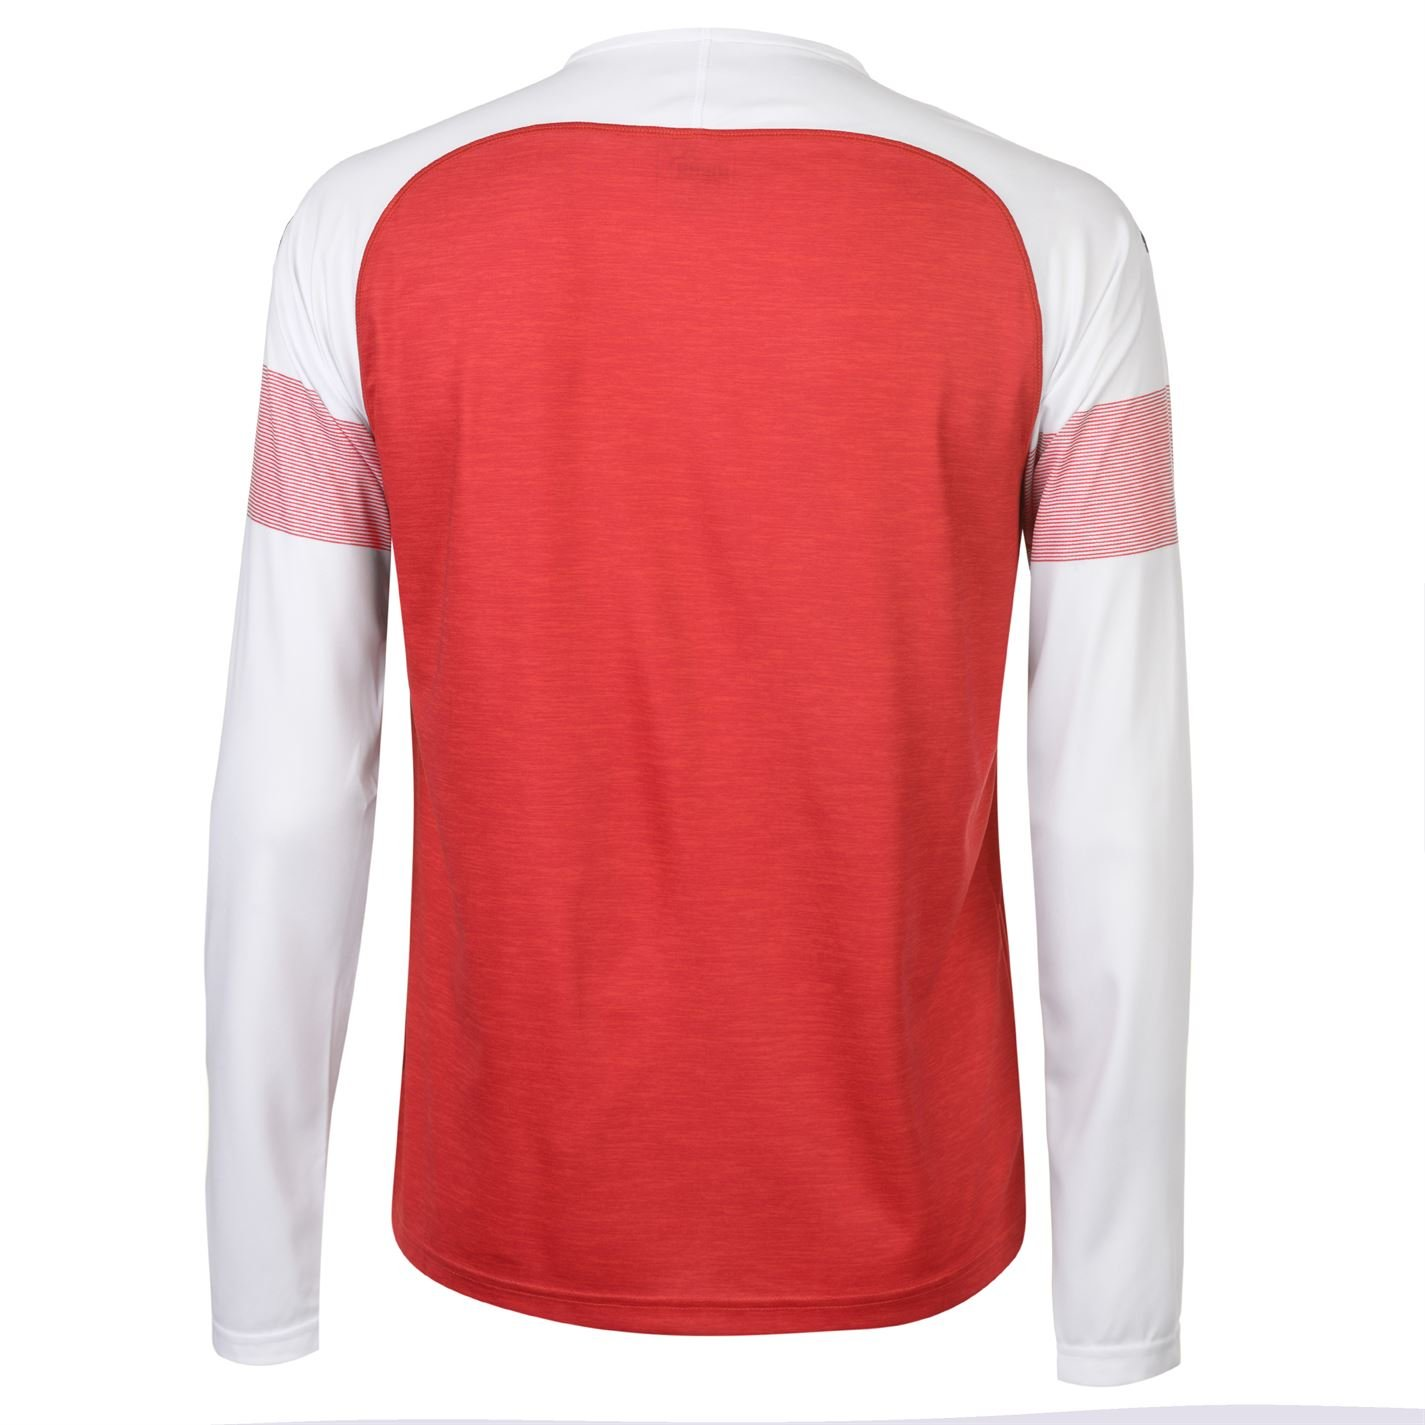 a35c85df9a7 Amazon.com   PUMA 2018-2019 Arsenal Home Long Sleeve Football Soccer T-Shirt  Jersey   Sports   Outdoors